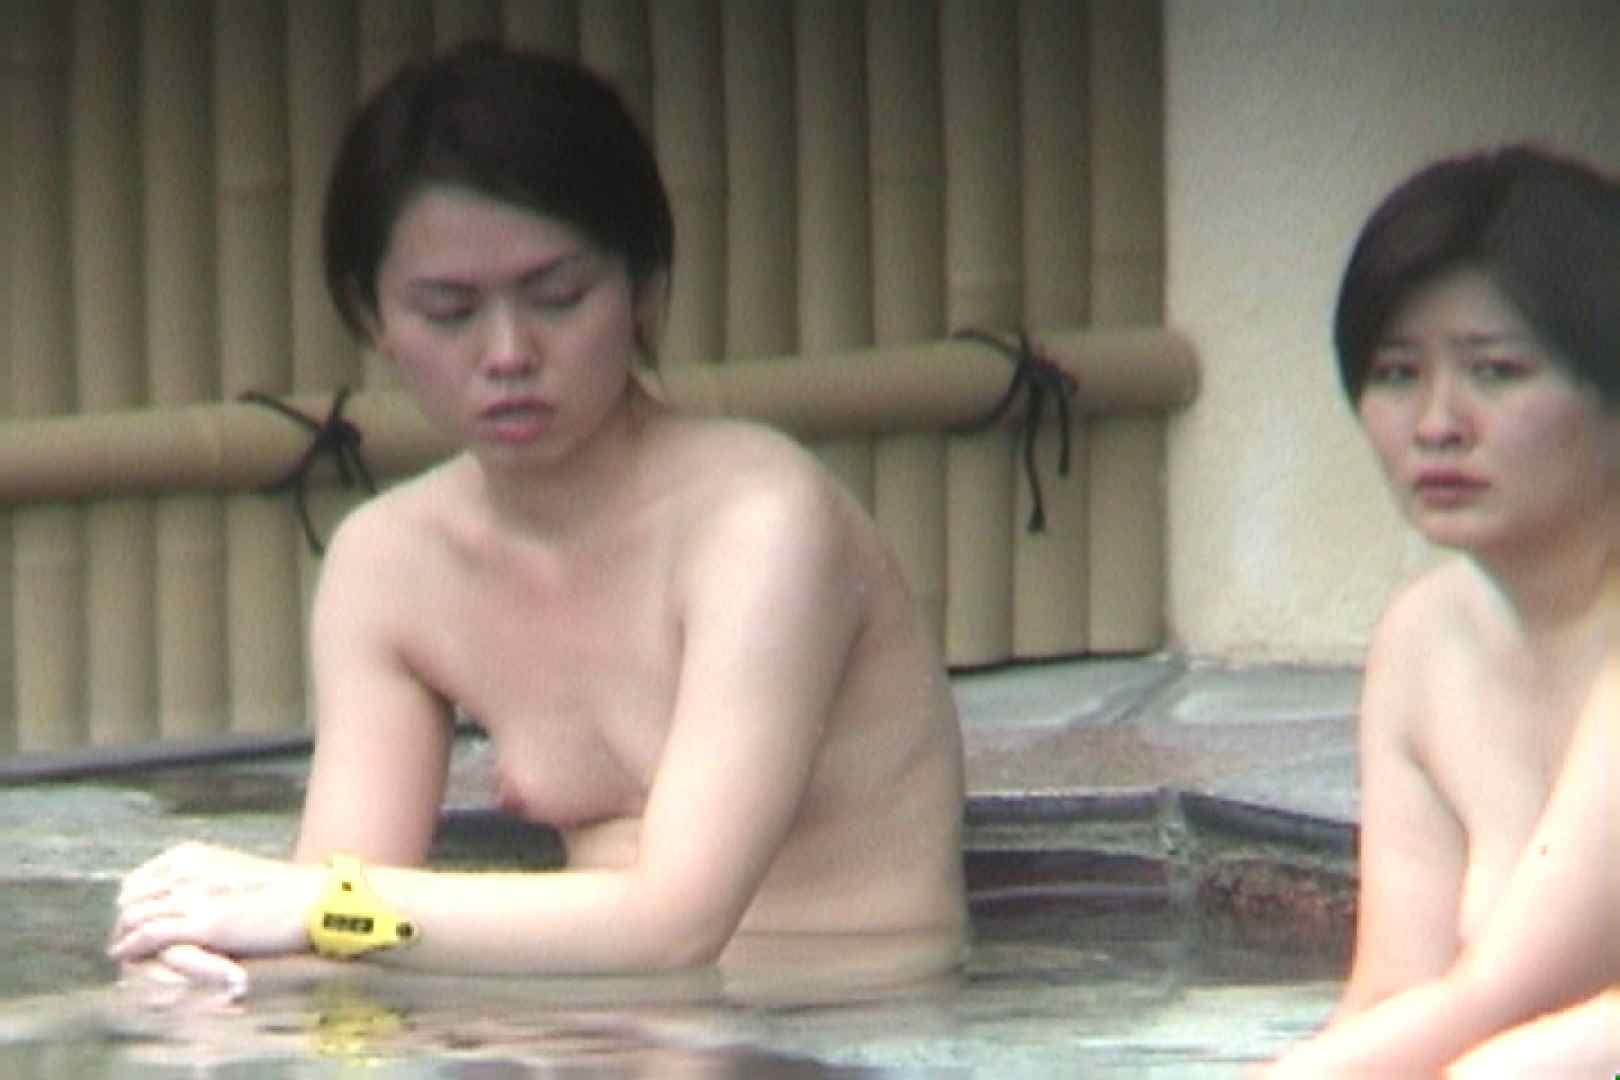 Aquaな露天風呂Vol.558 OLセックス | 盗撮  81画像 40